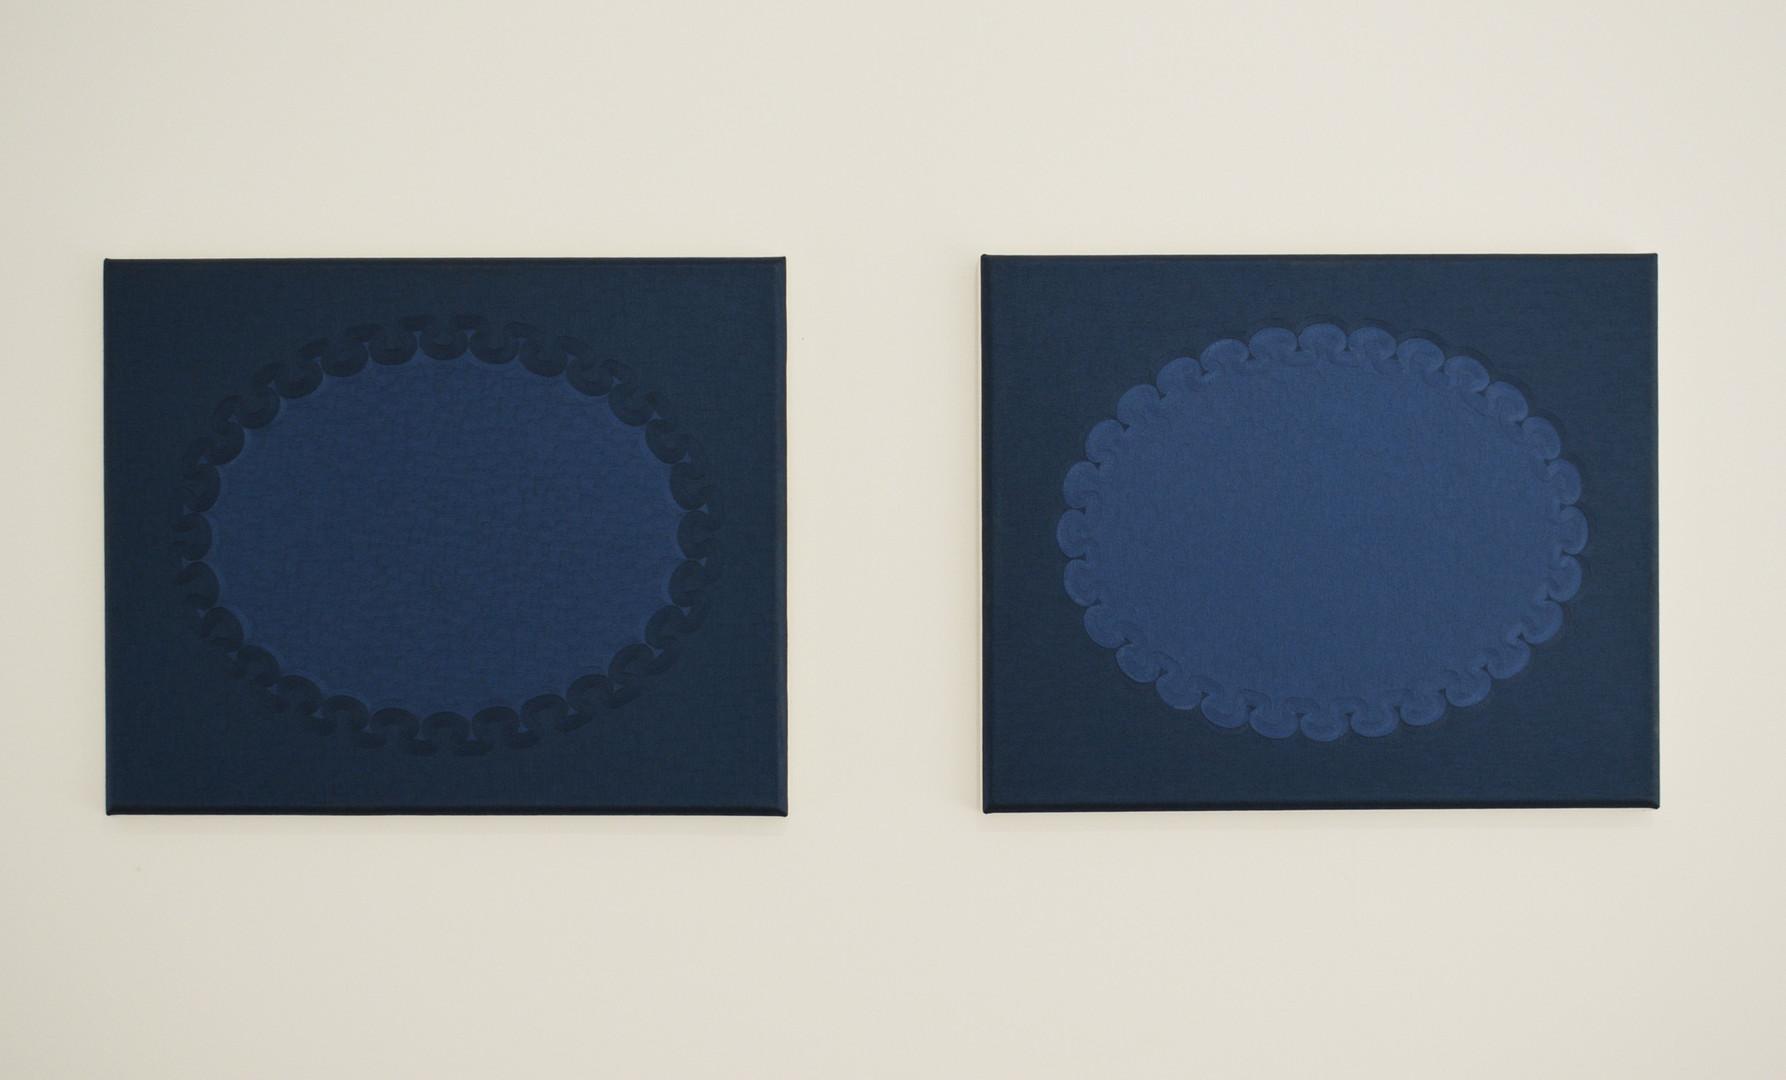 Jane Harris, 'Yonder (Diptych)', Oil on